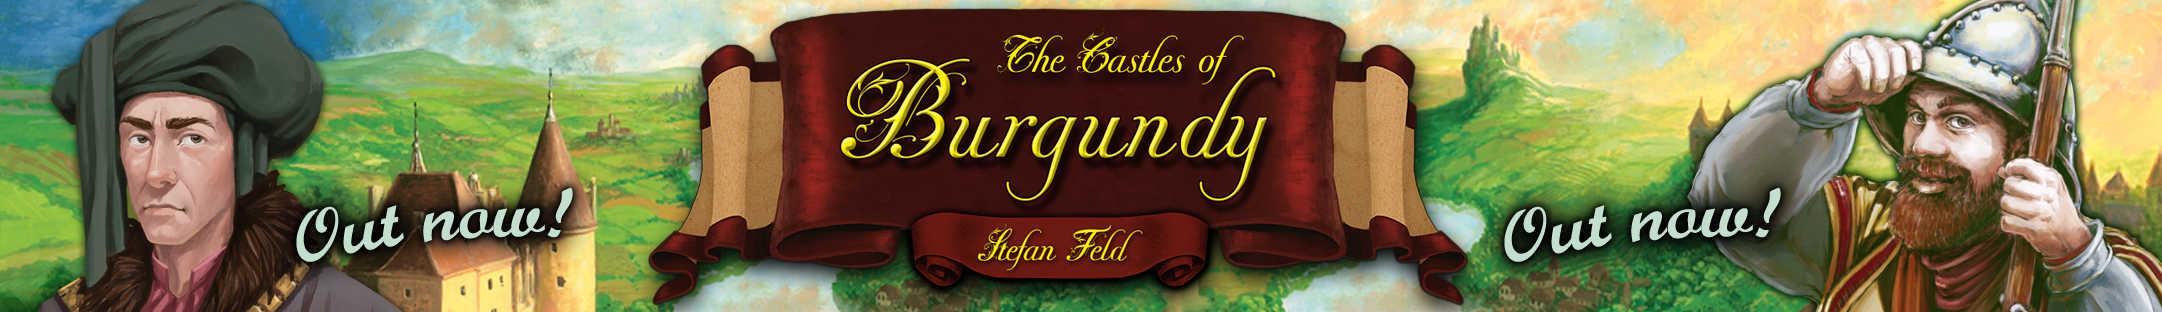 Castles of Burgundy by Stefan Feld